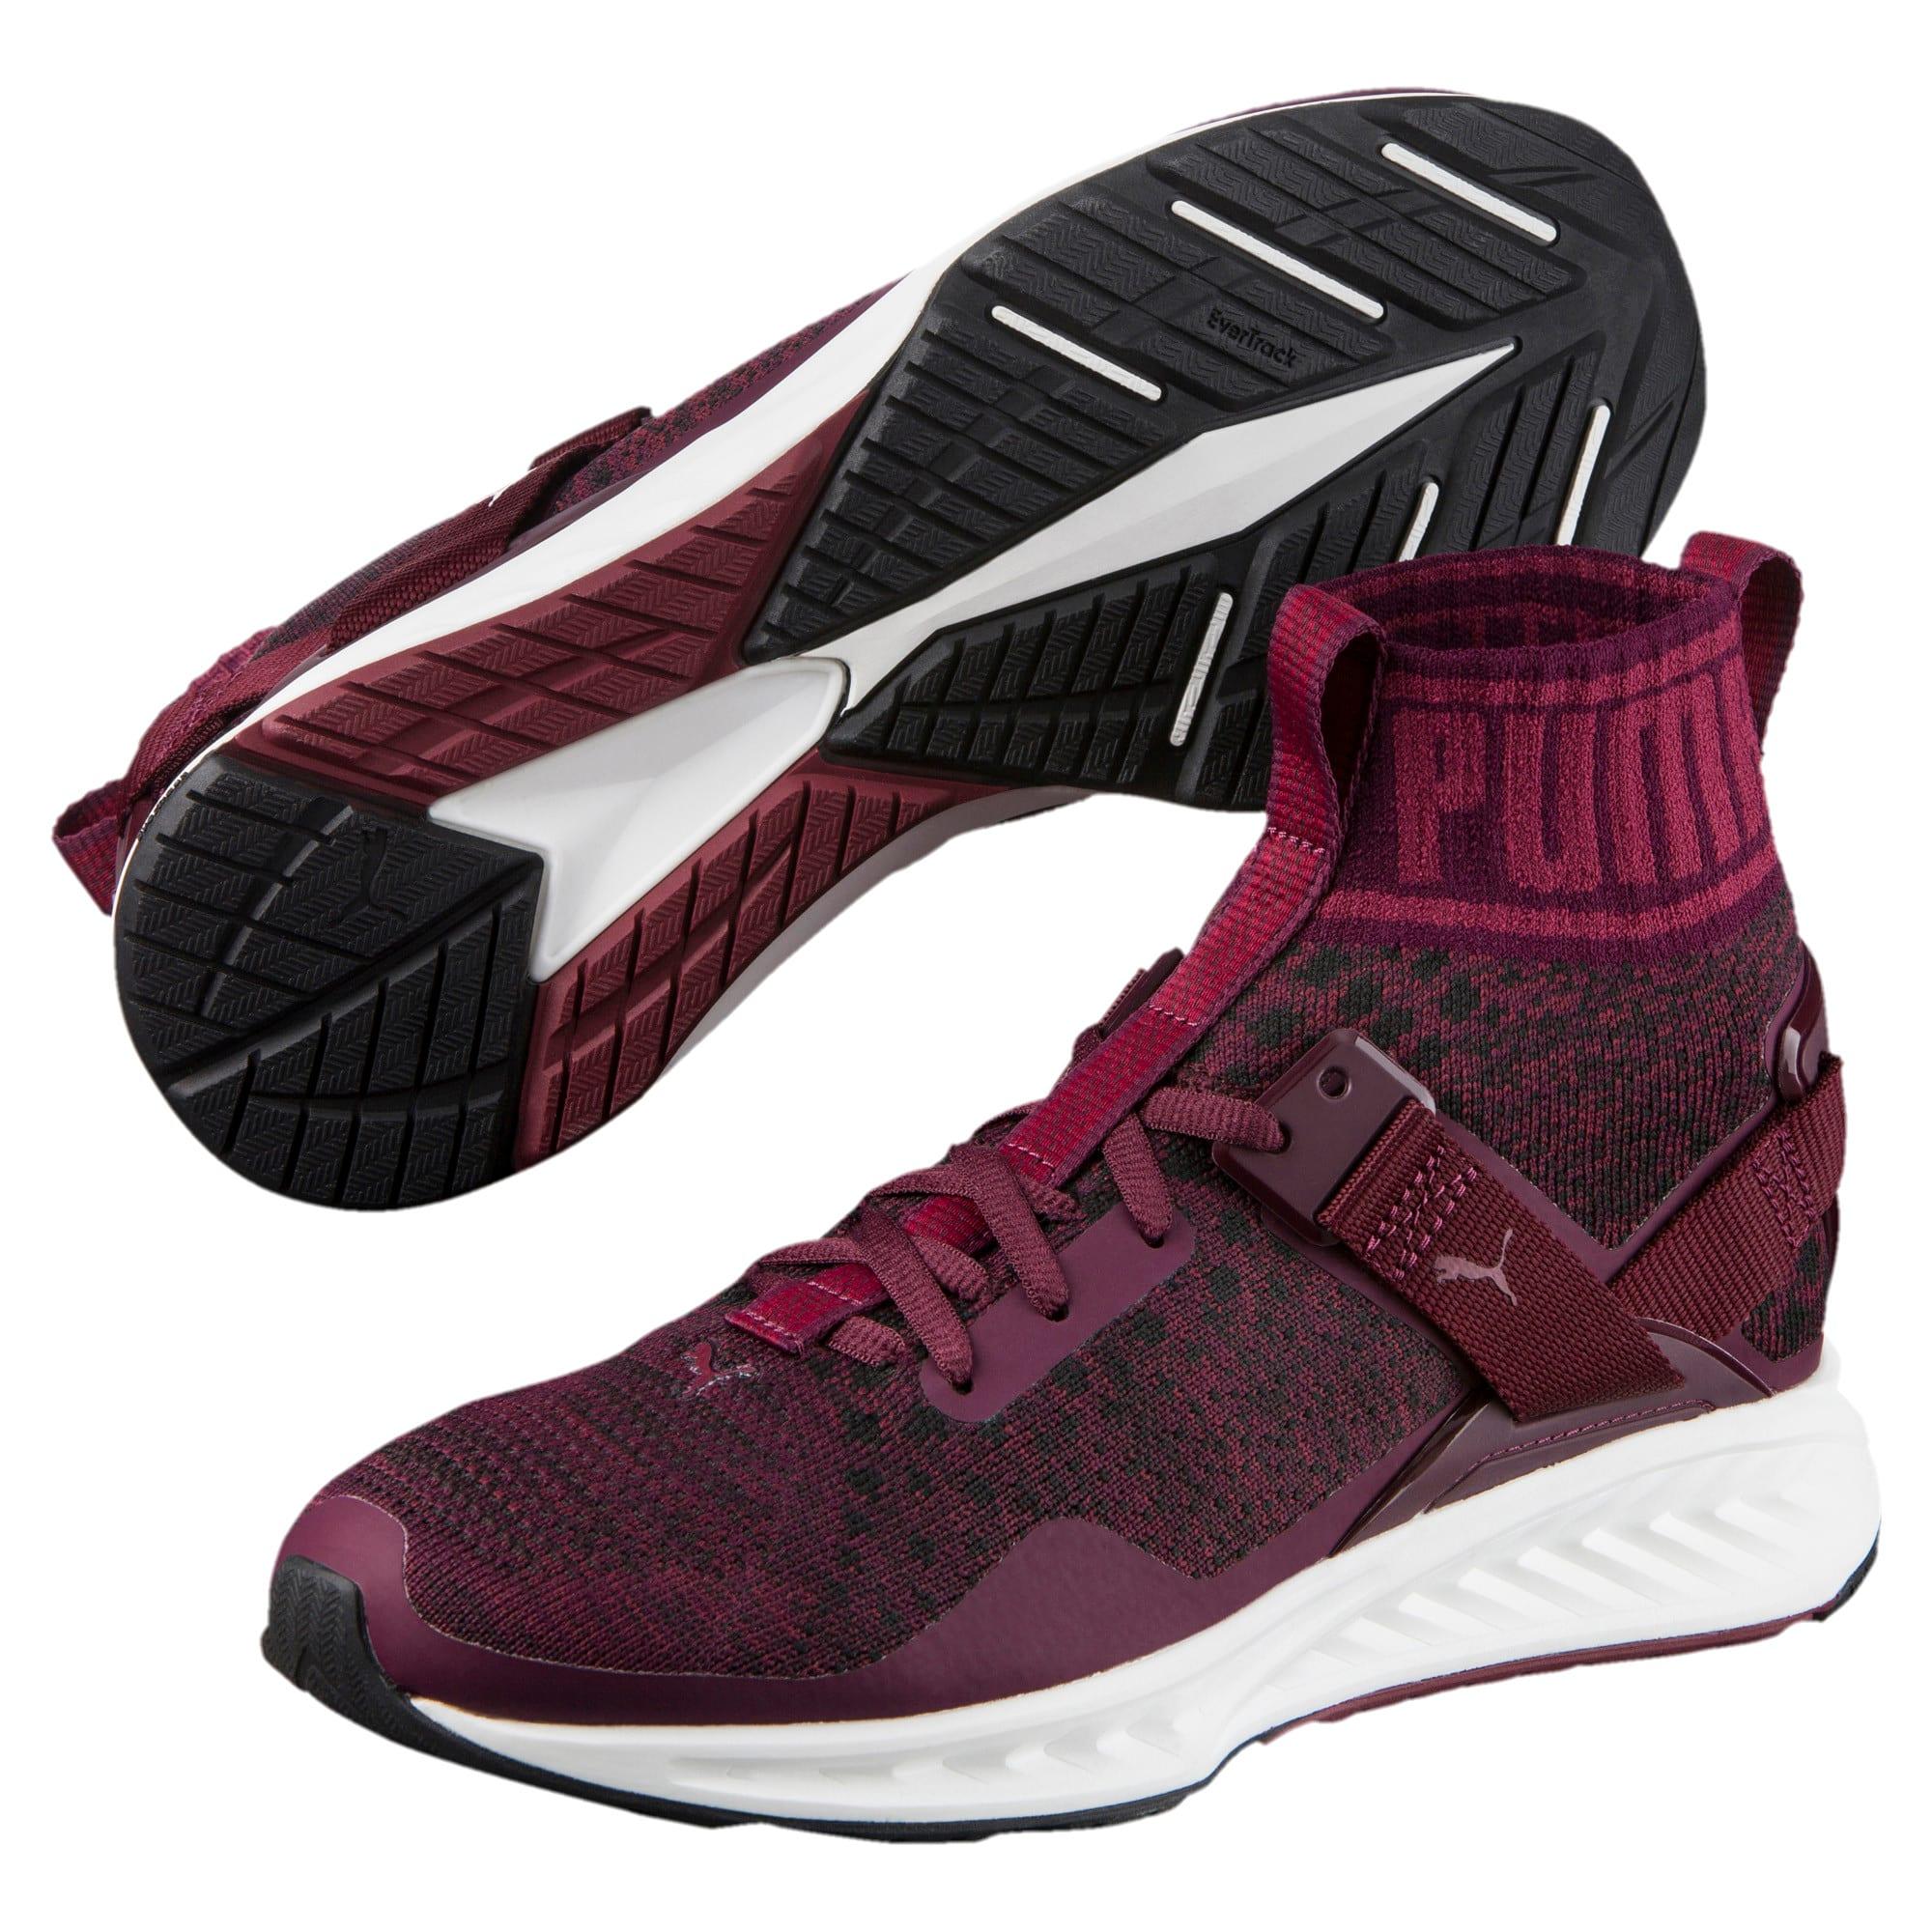 Thumbnail 2 of IGNITE evoKNIT Women's Training Shoes, Winetasting-CABARET-Black, medium